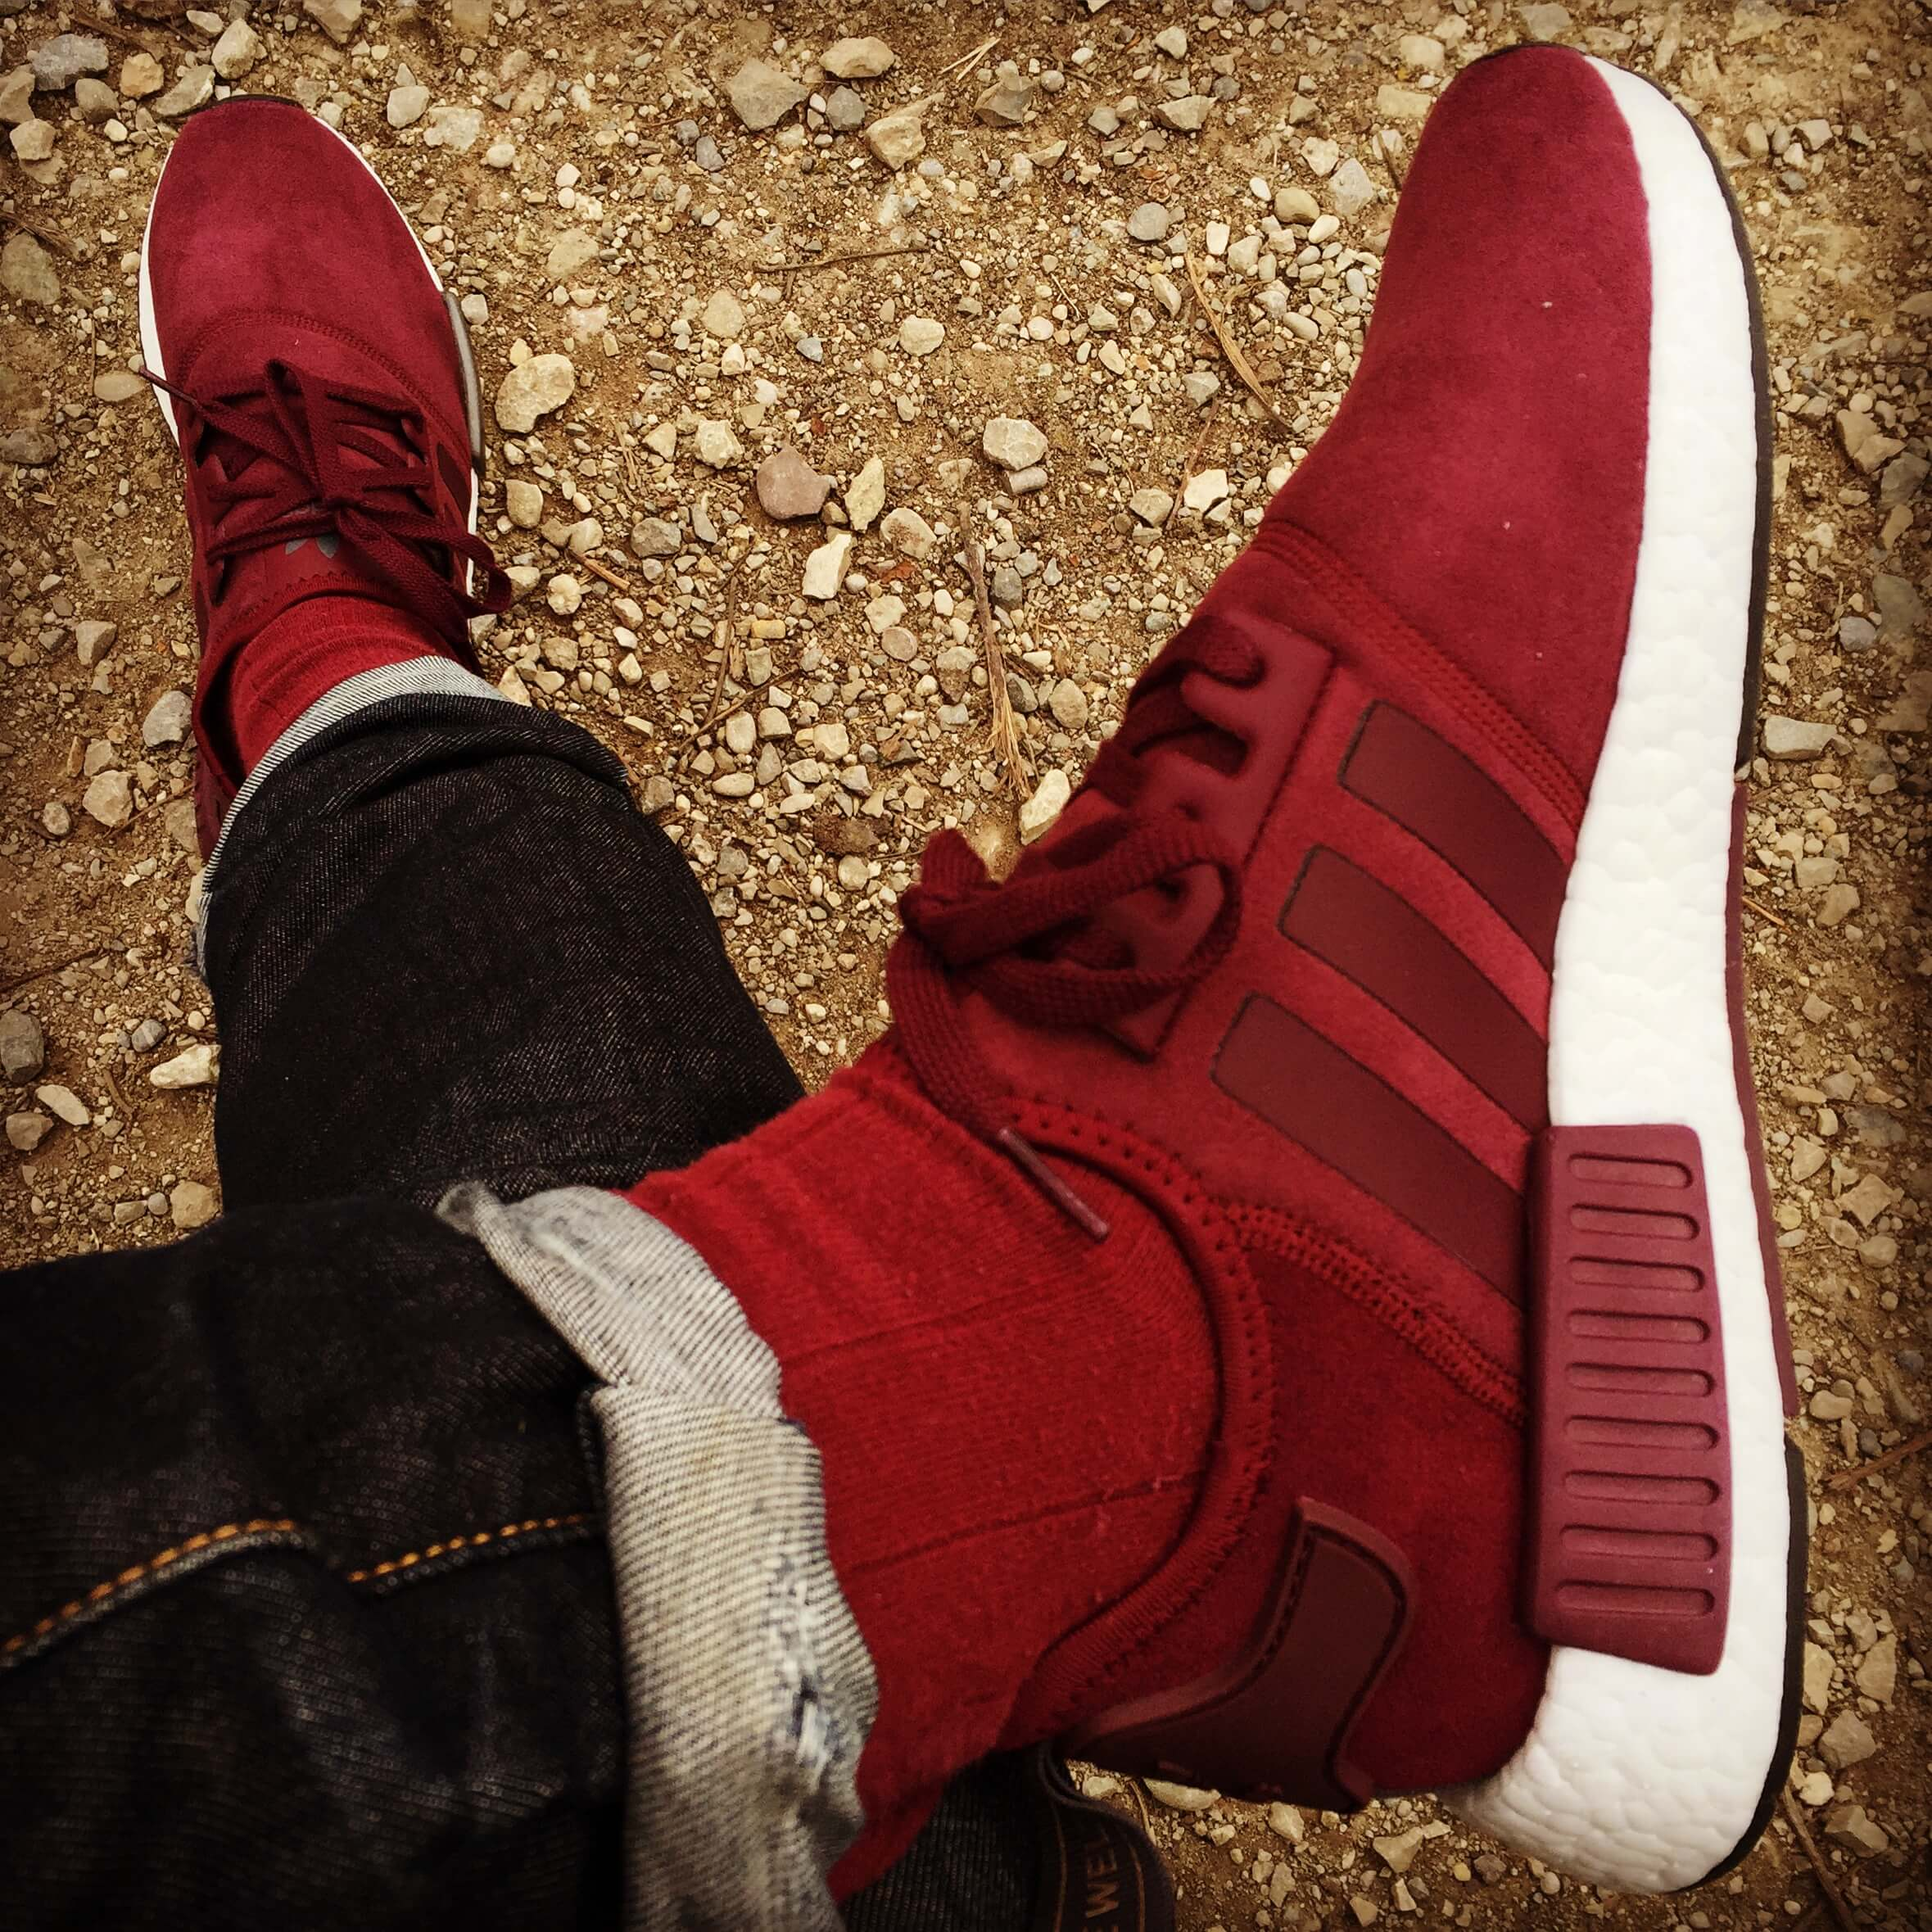 Adidas-NMD-R1-Suede-Top-View-Benstah-Onfeet